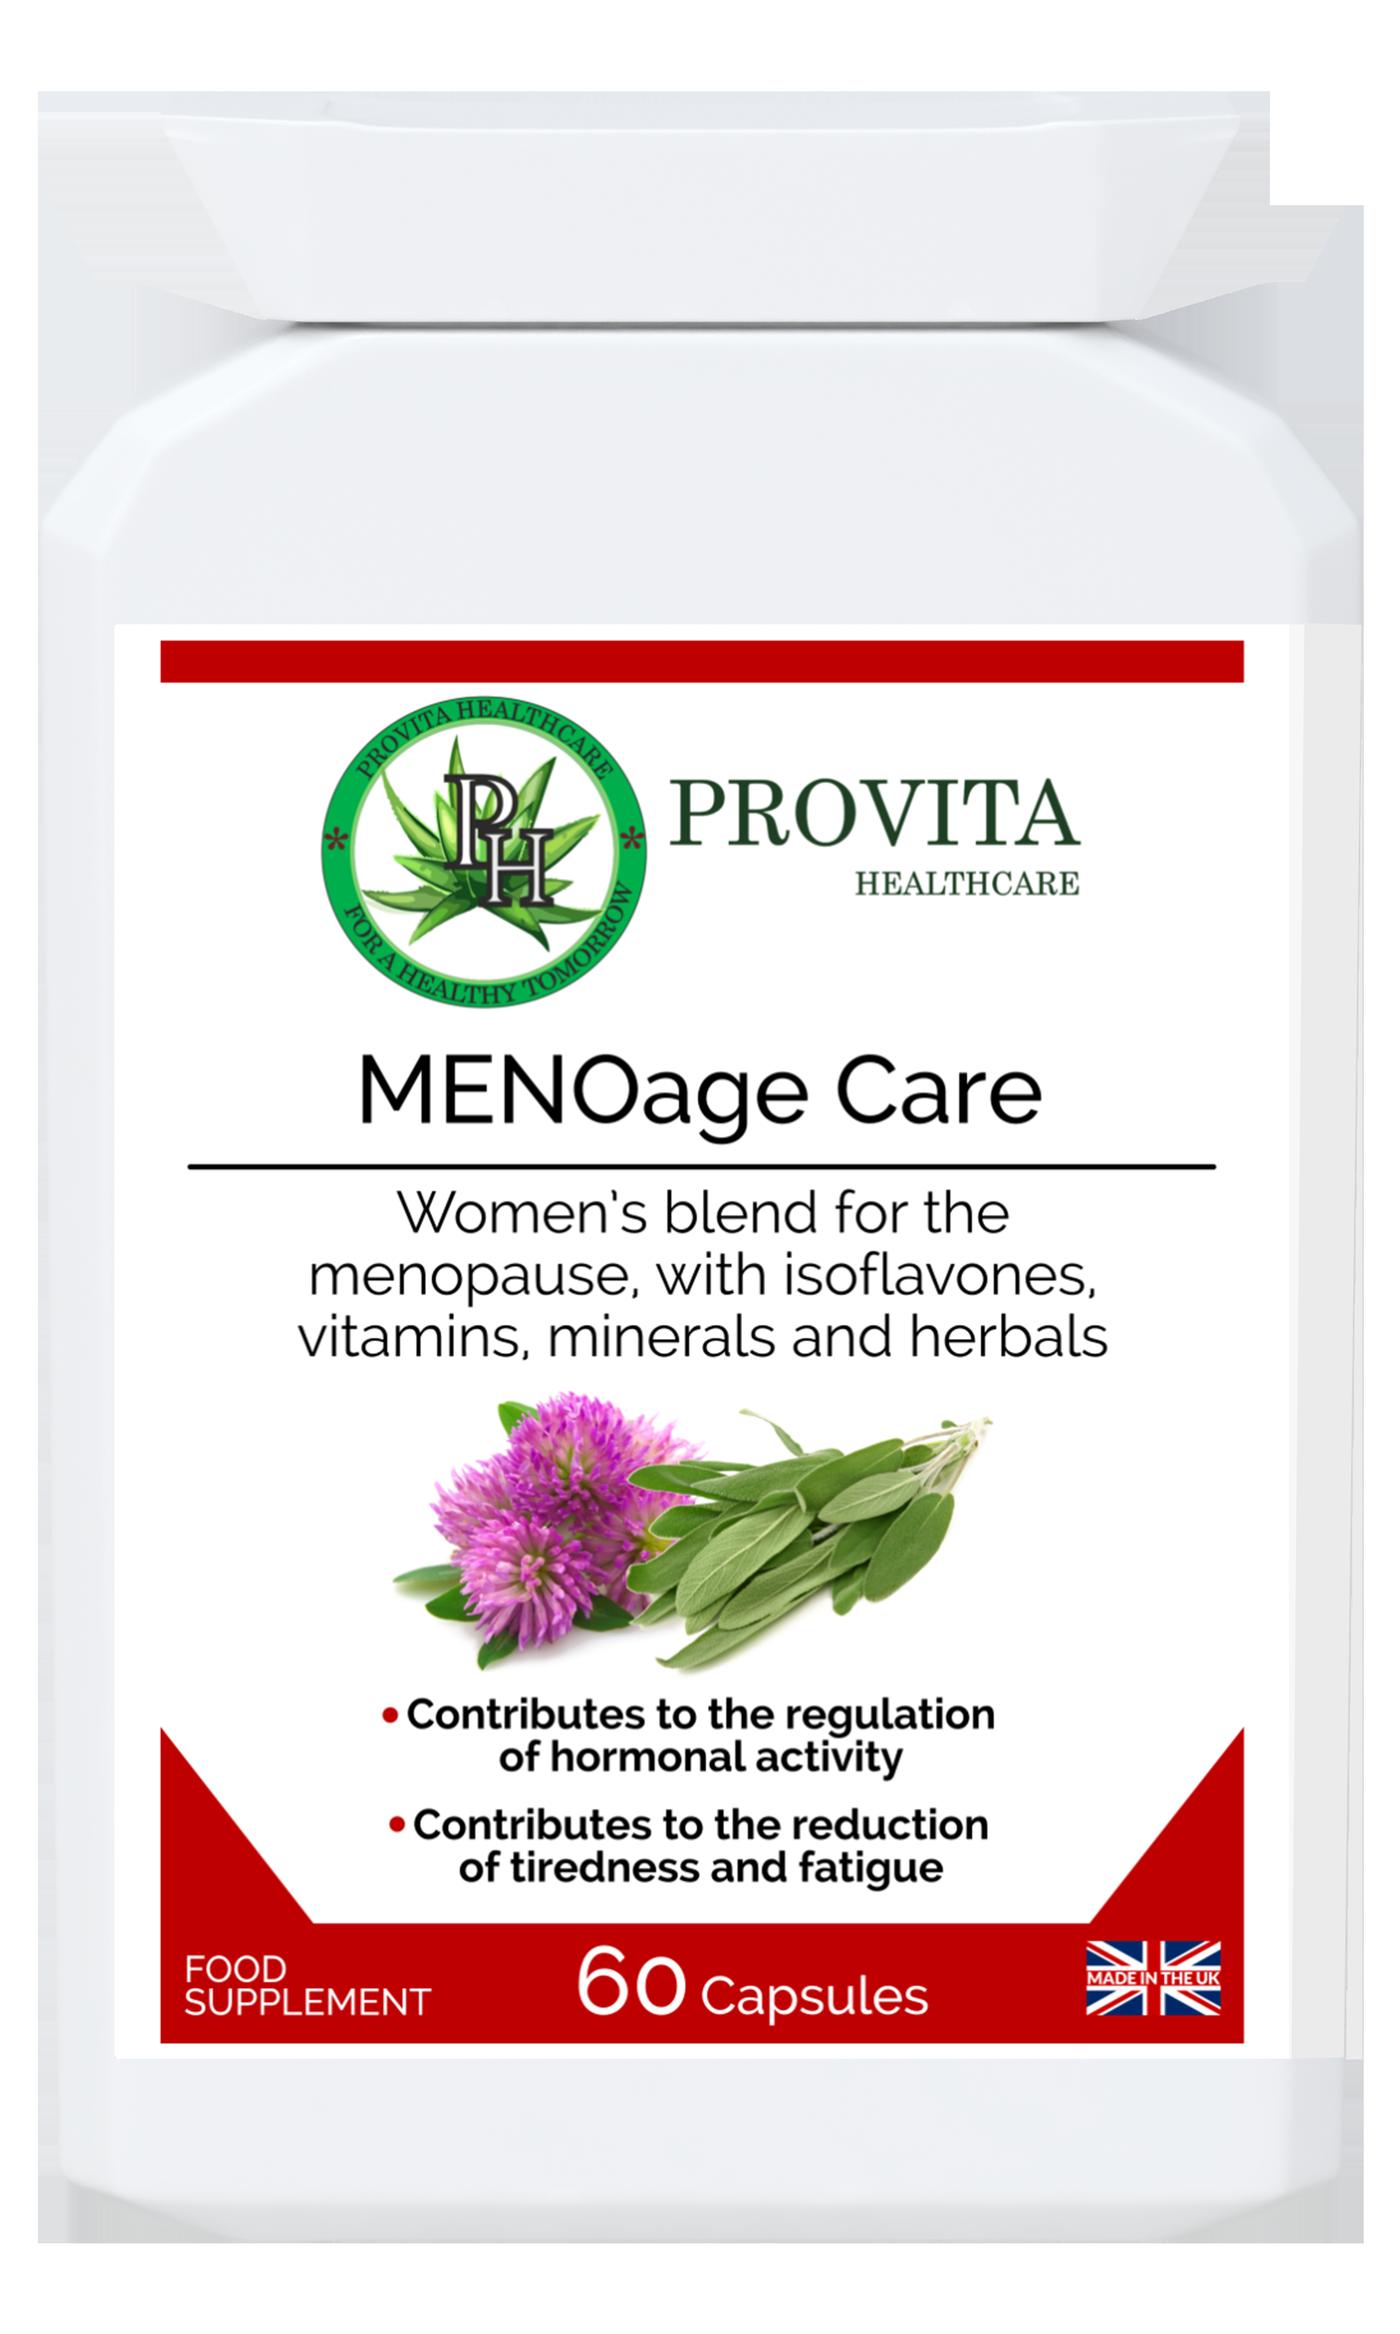 MENOage Care